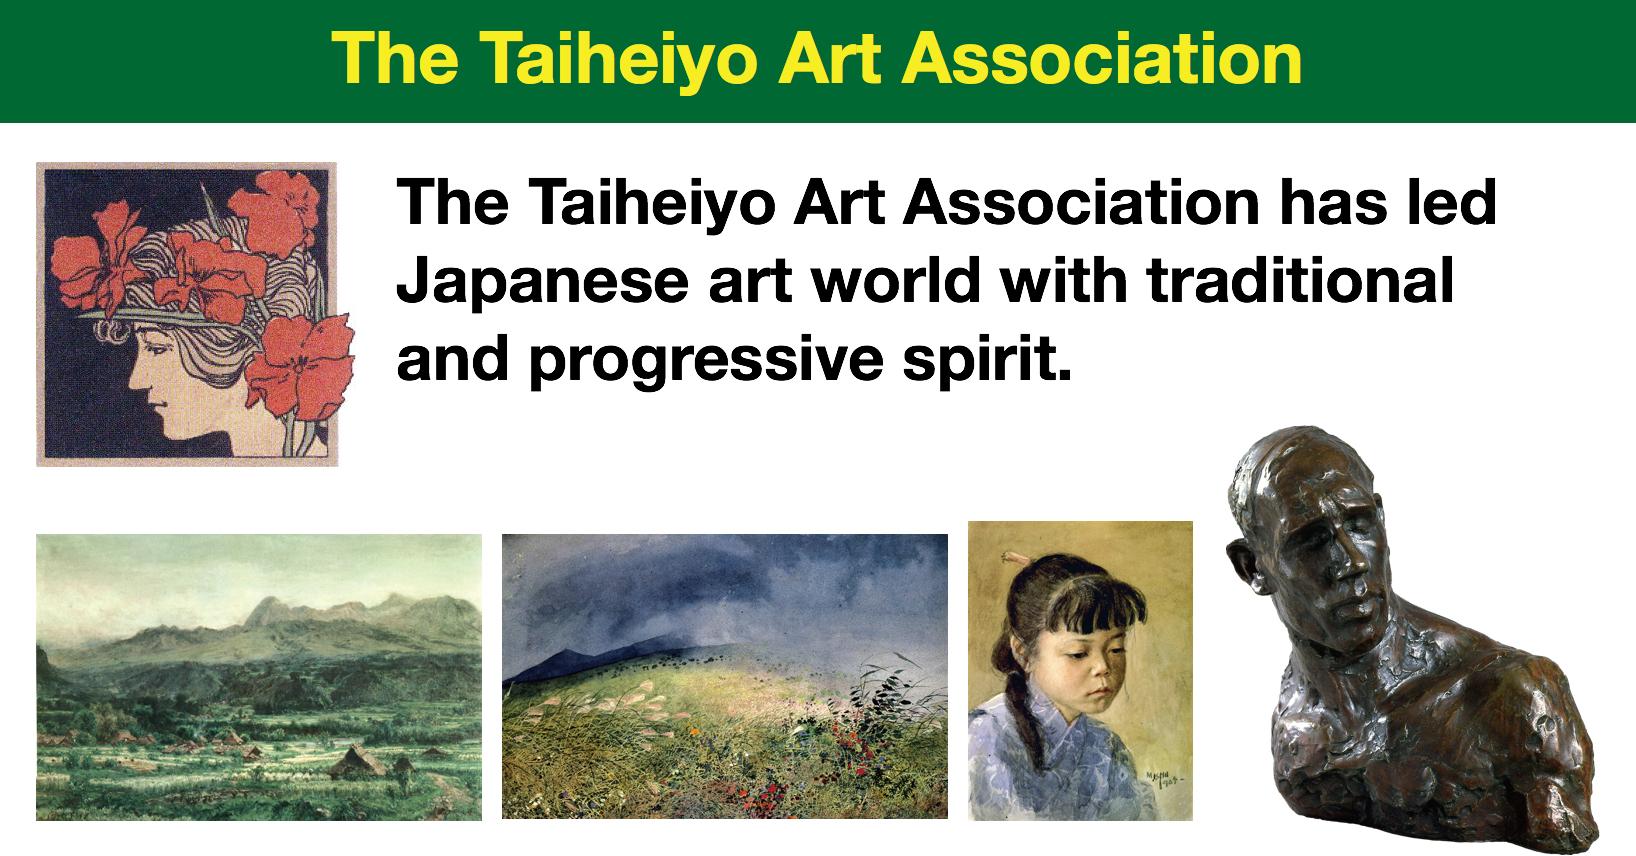 The Taiheiyo Art Association